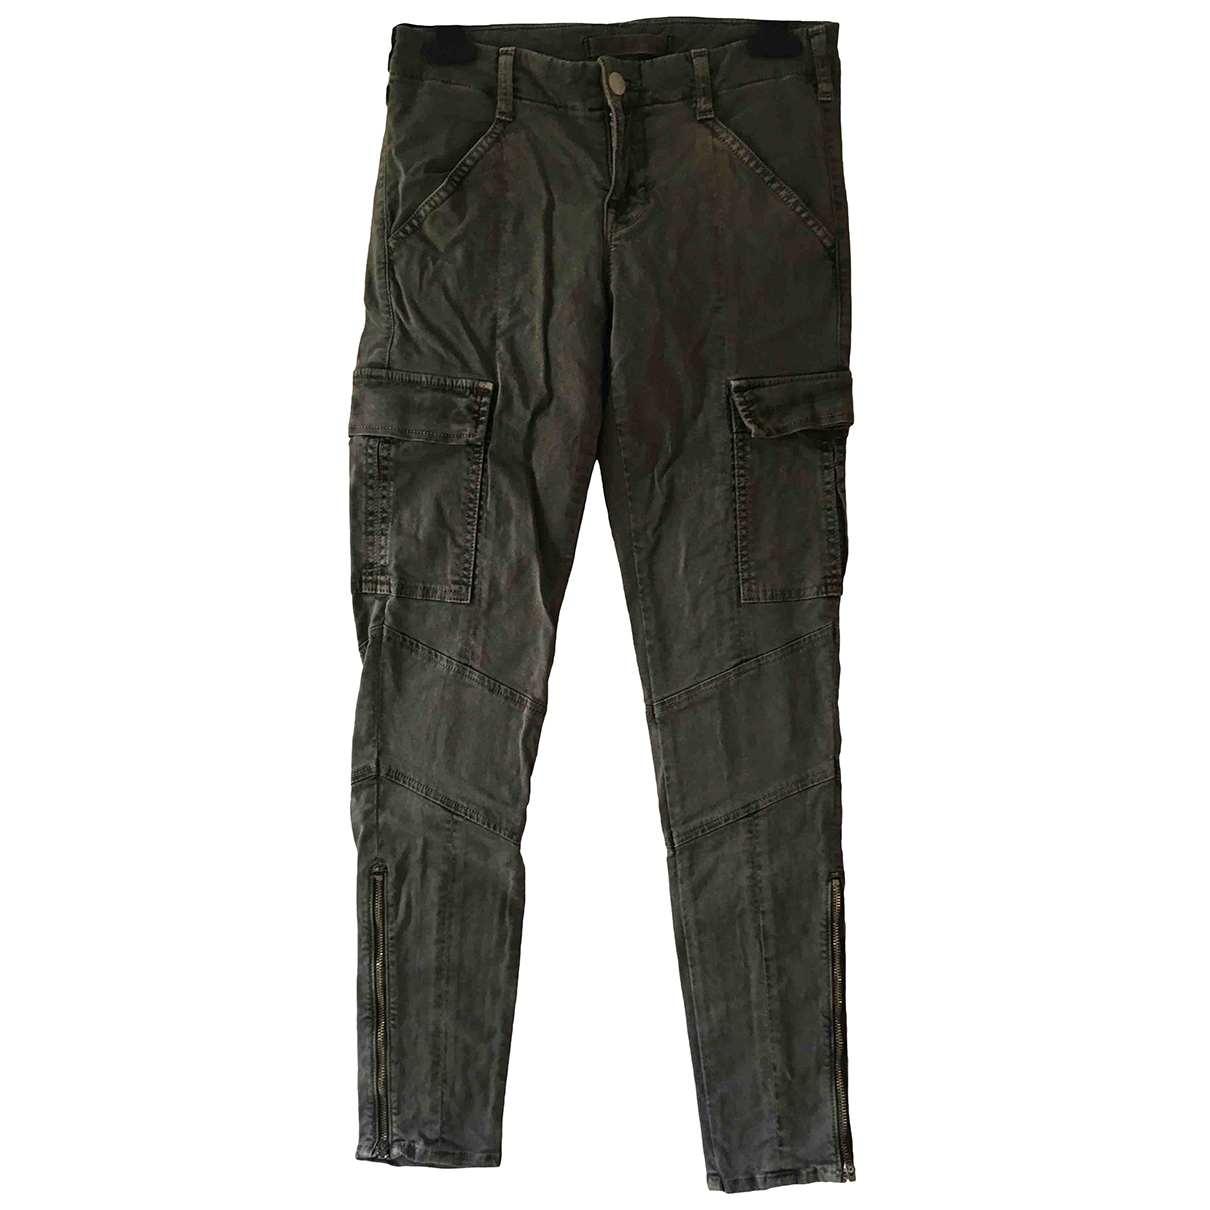 J Brand \N Khaki Cotton - elasthane Jeans for Women 25 US